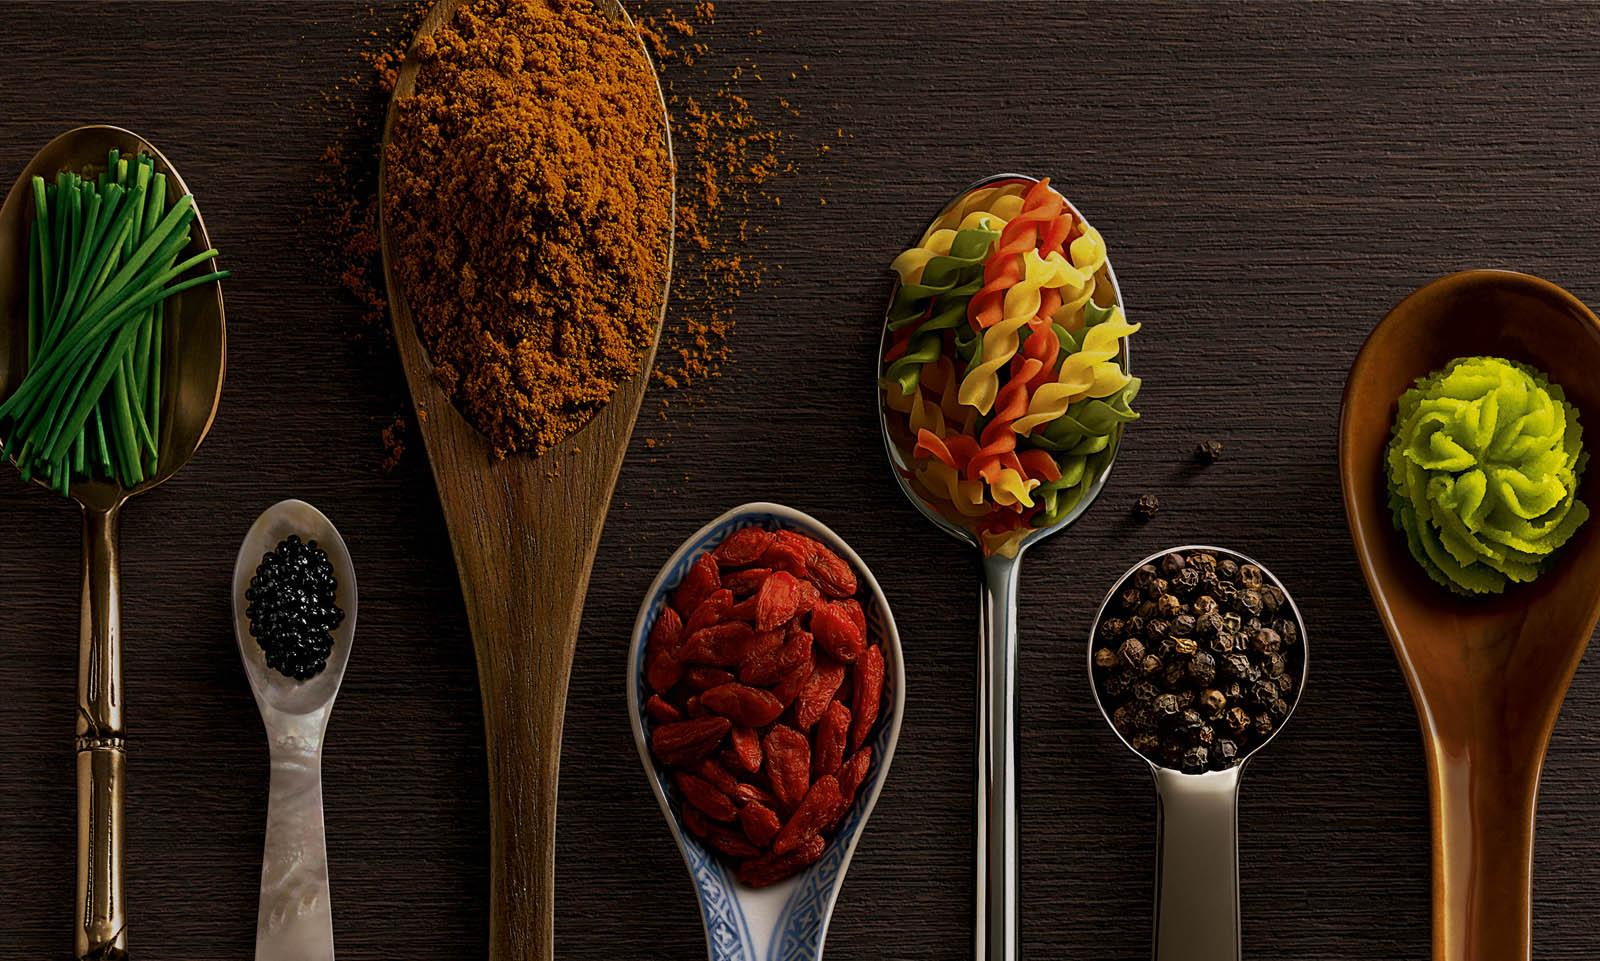 HR_SIA_Spices_#150_IncMaster.jpg